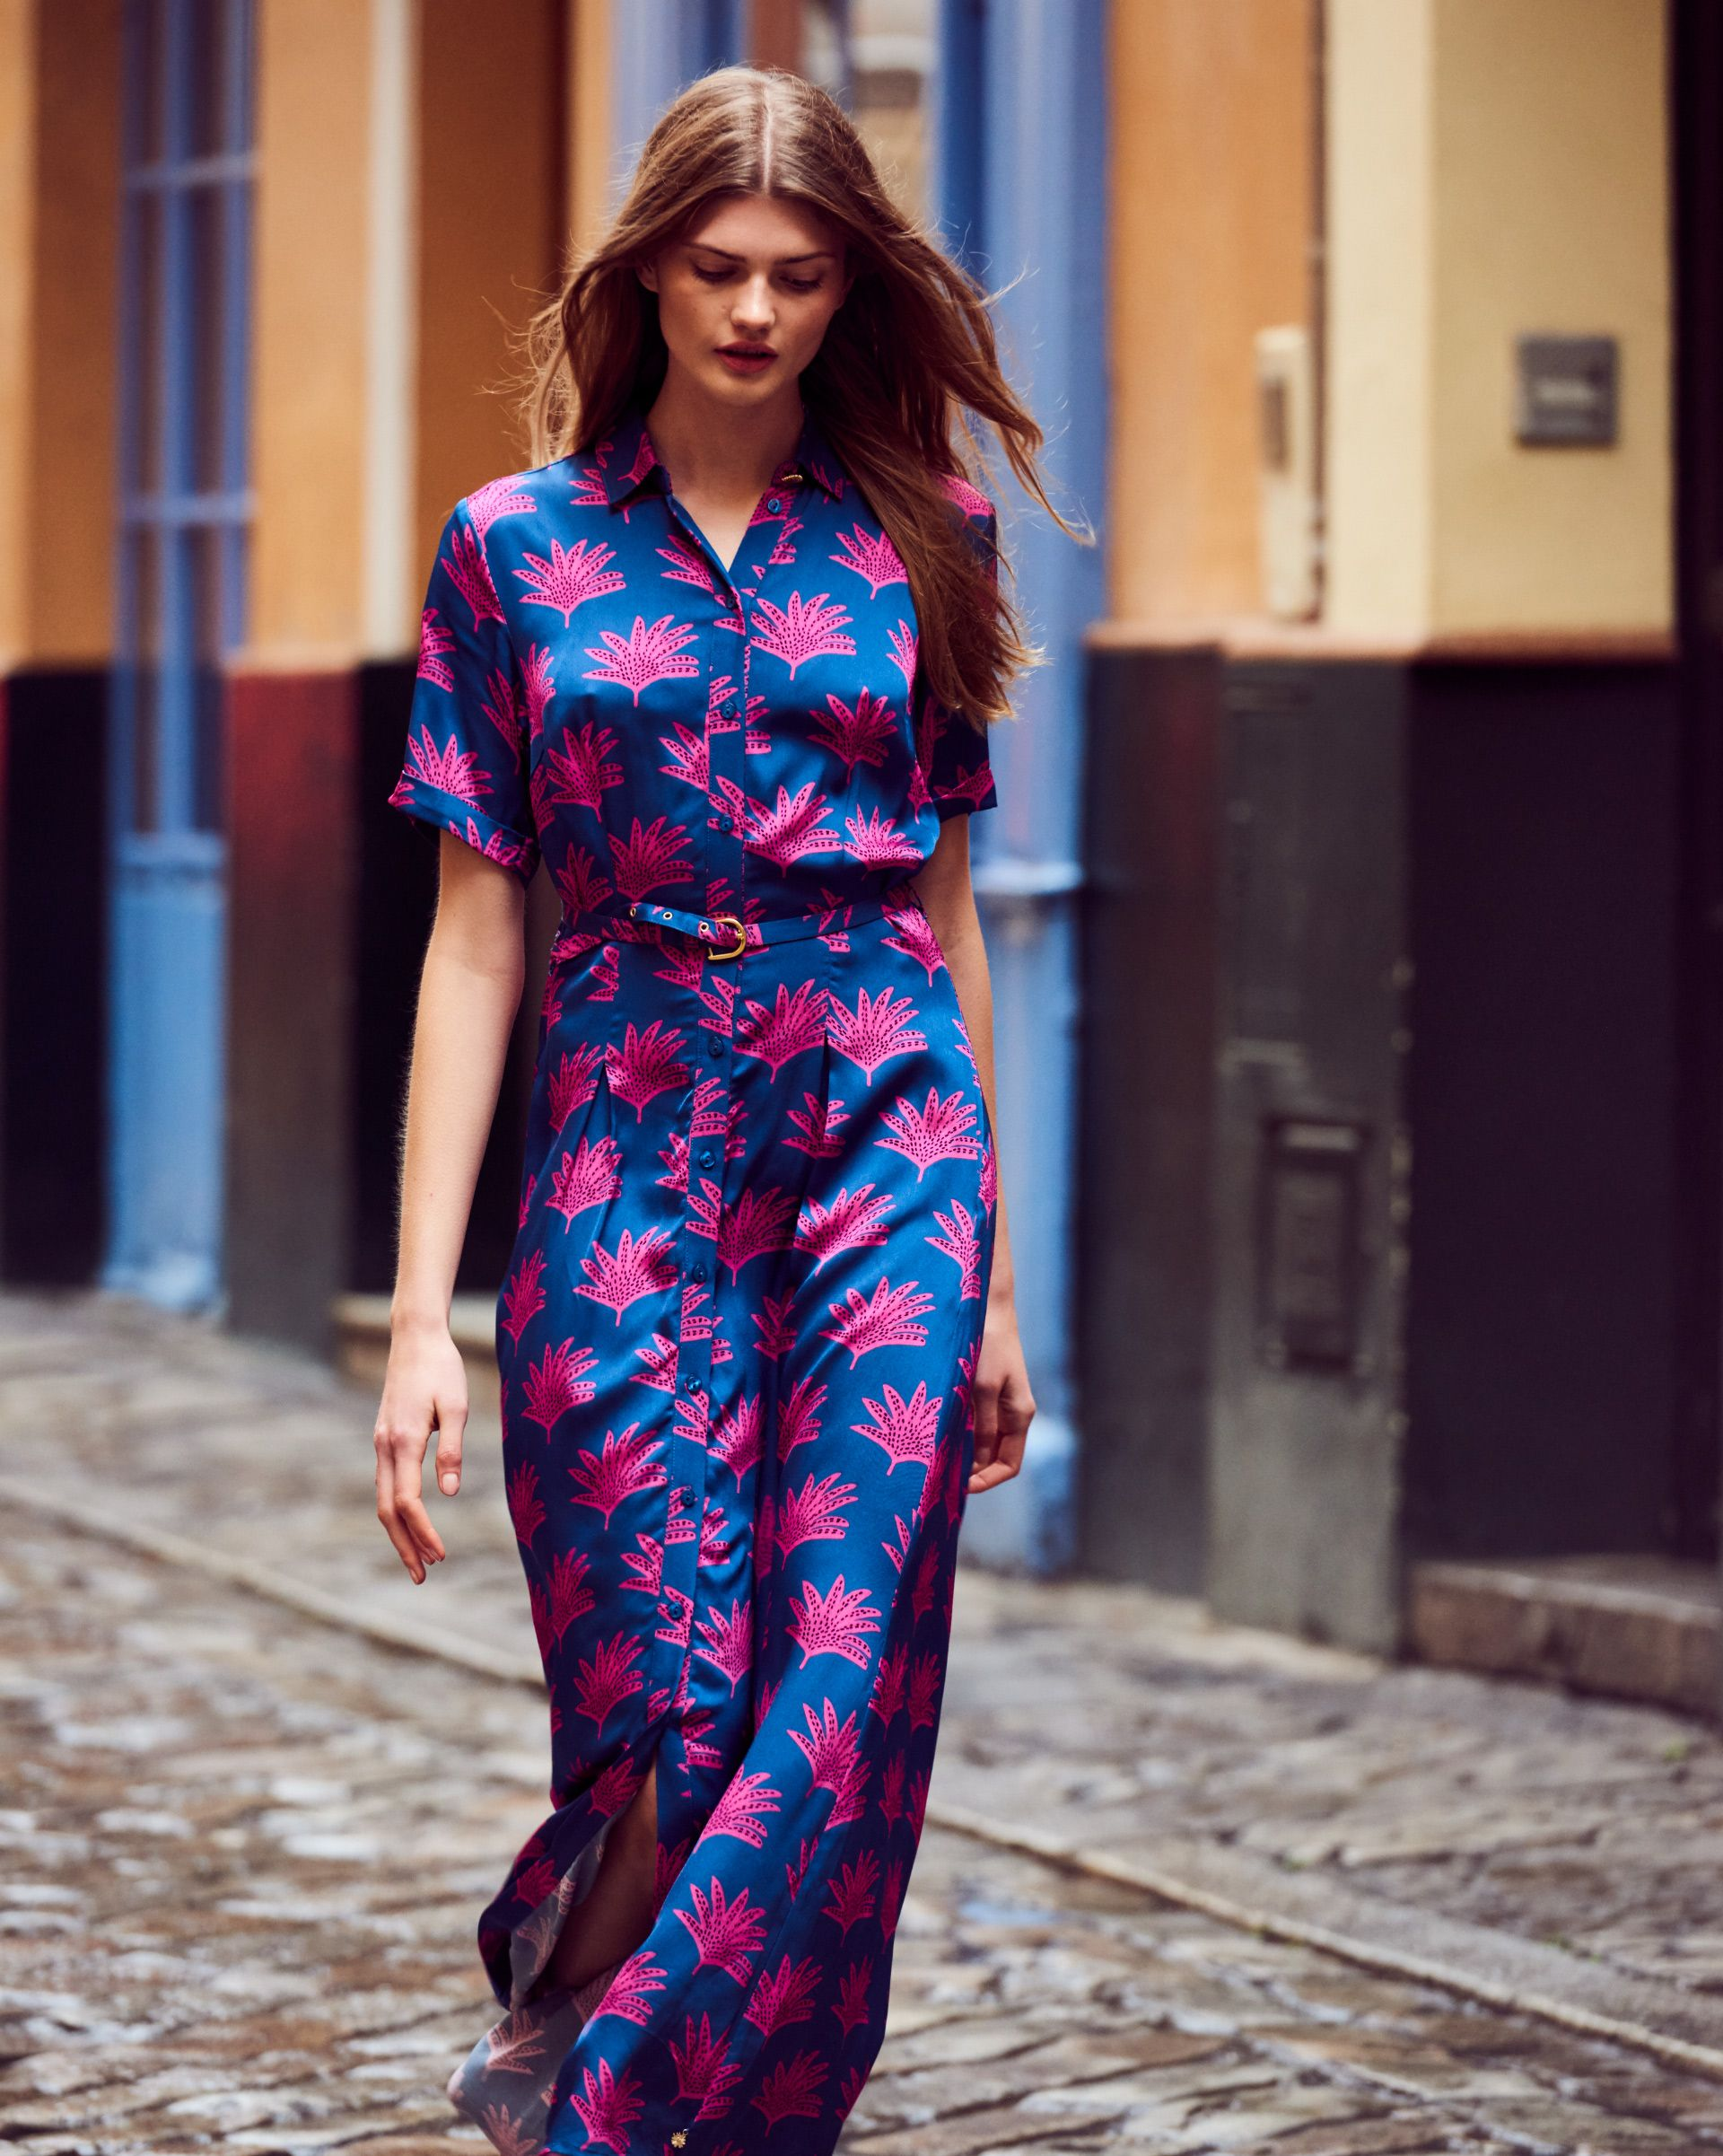 11++ Fashion mia dress reviews information